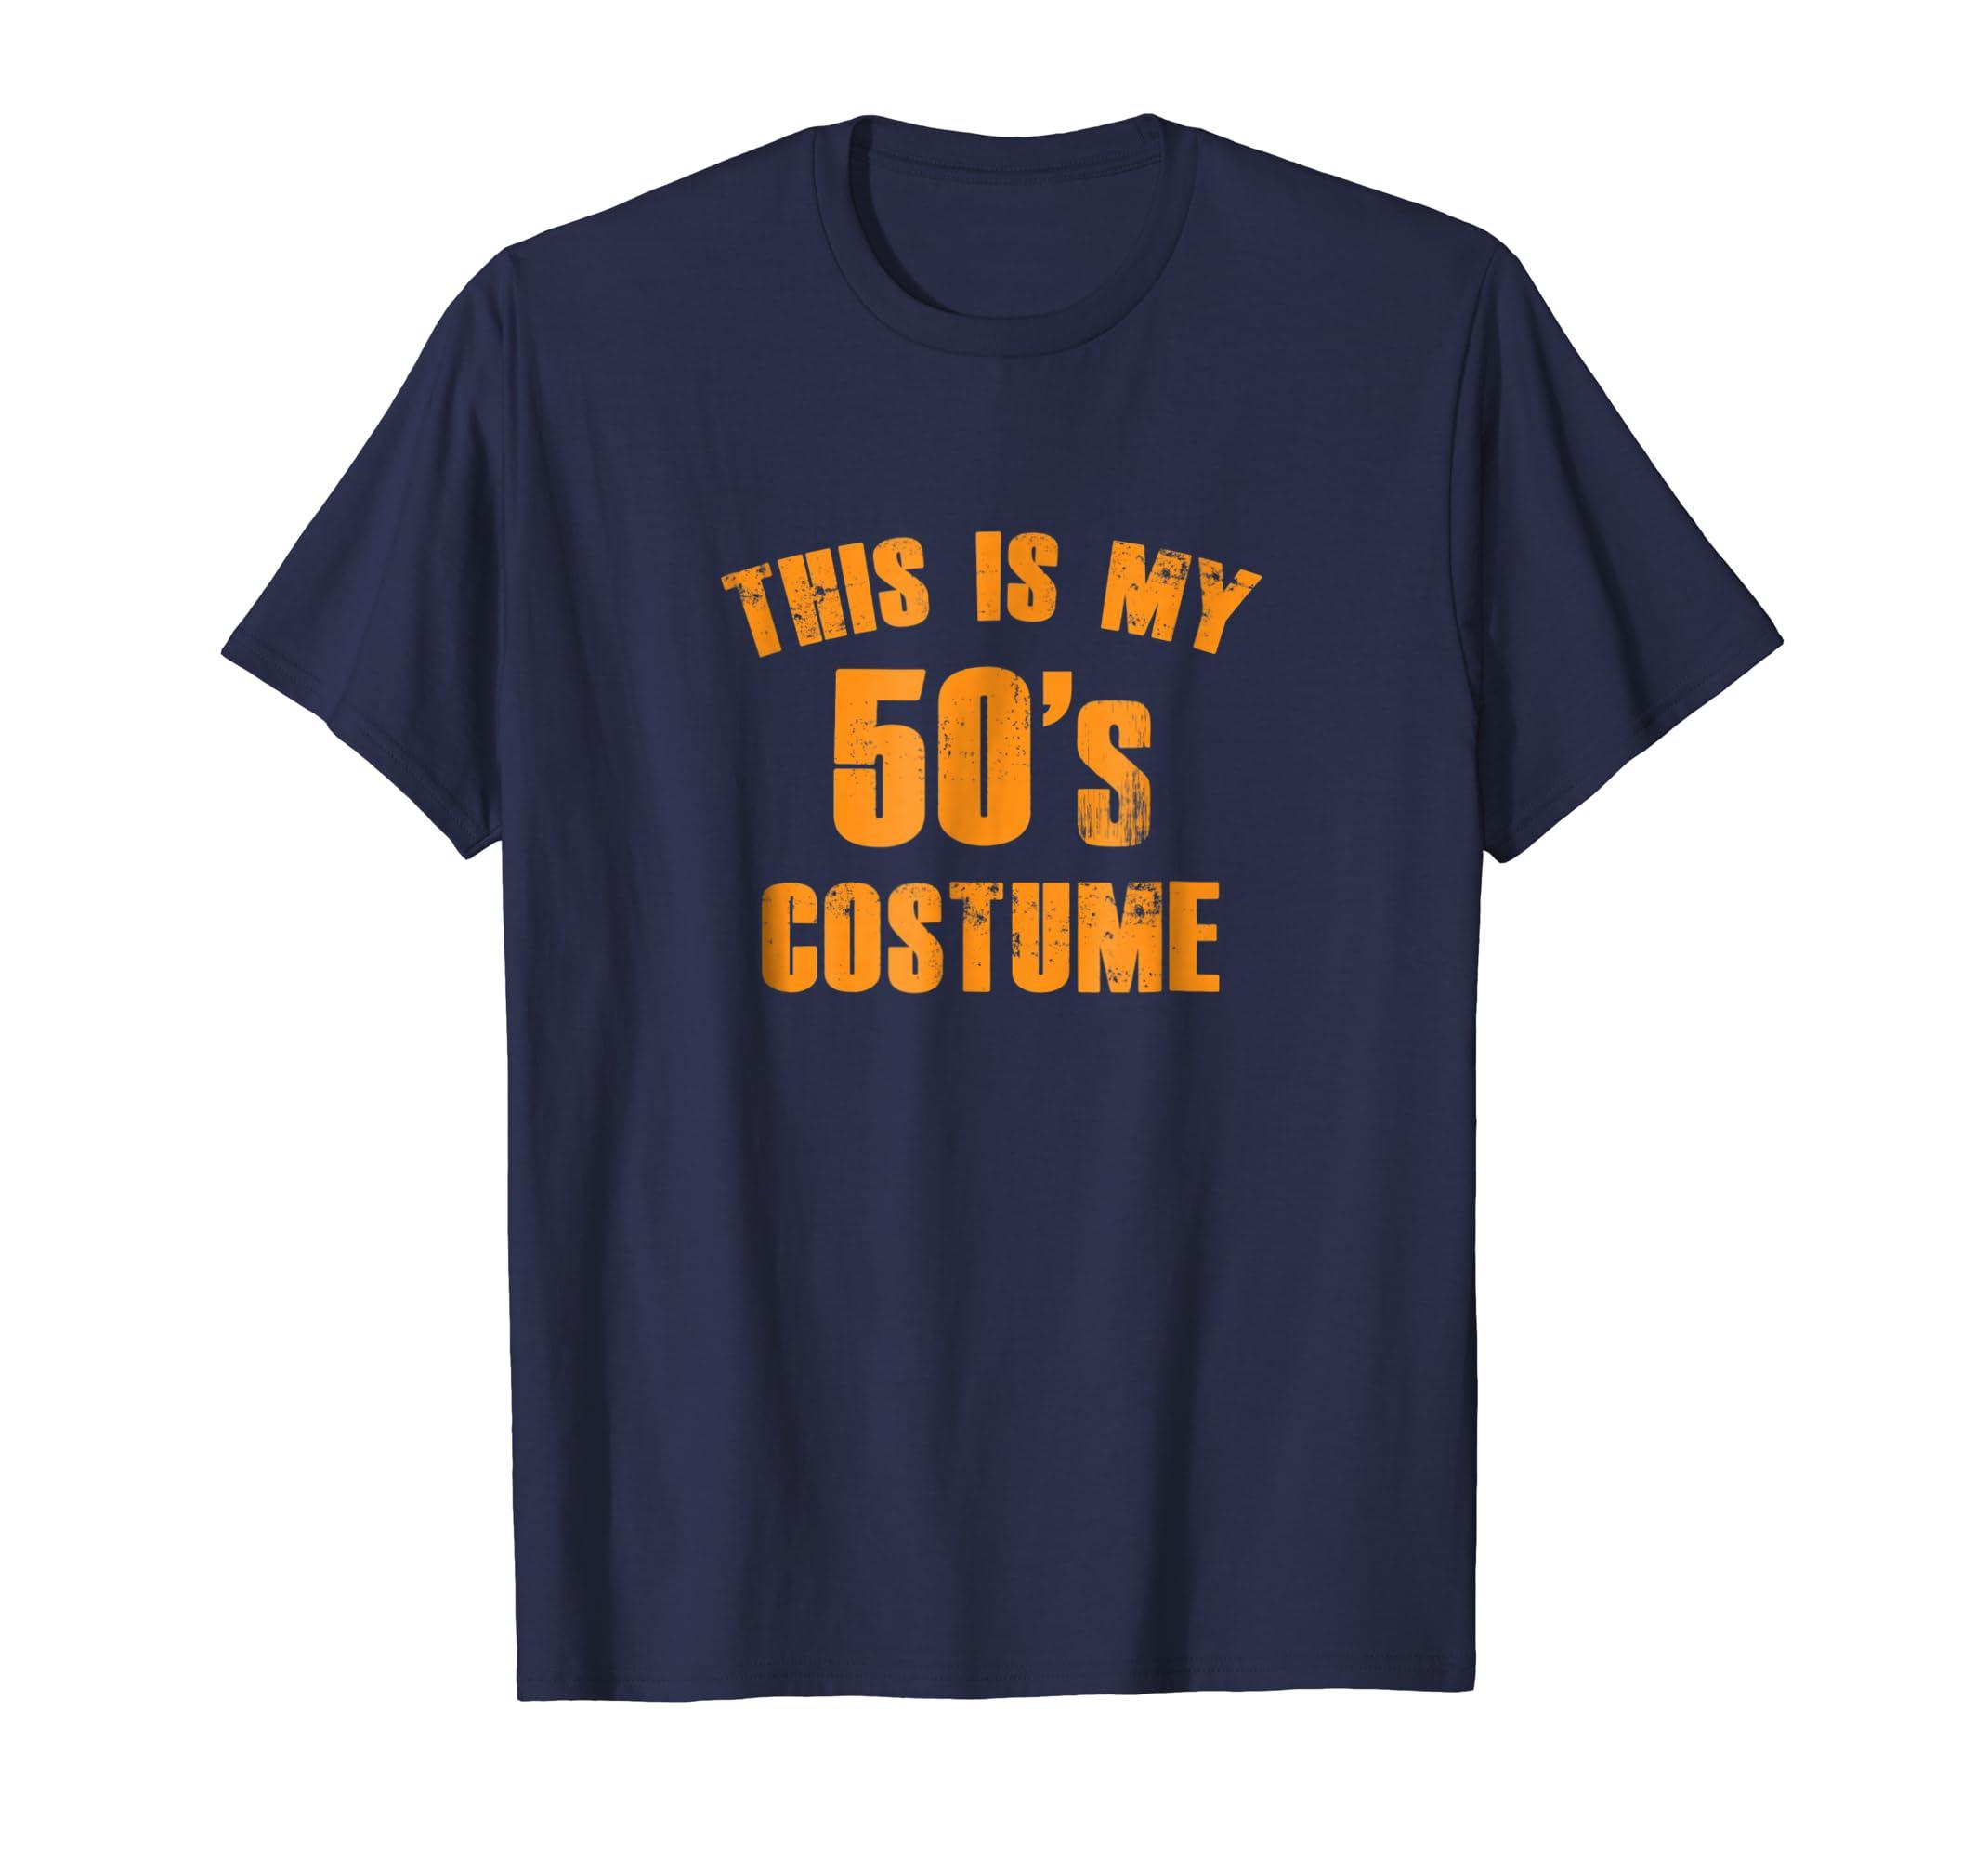 50s Costume Halloween Shirt for 1950s Party men women top-Rose